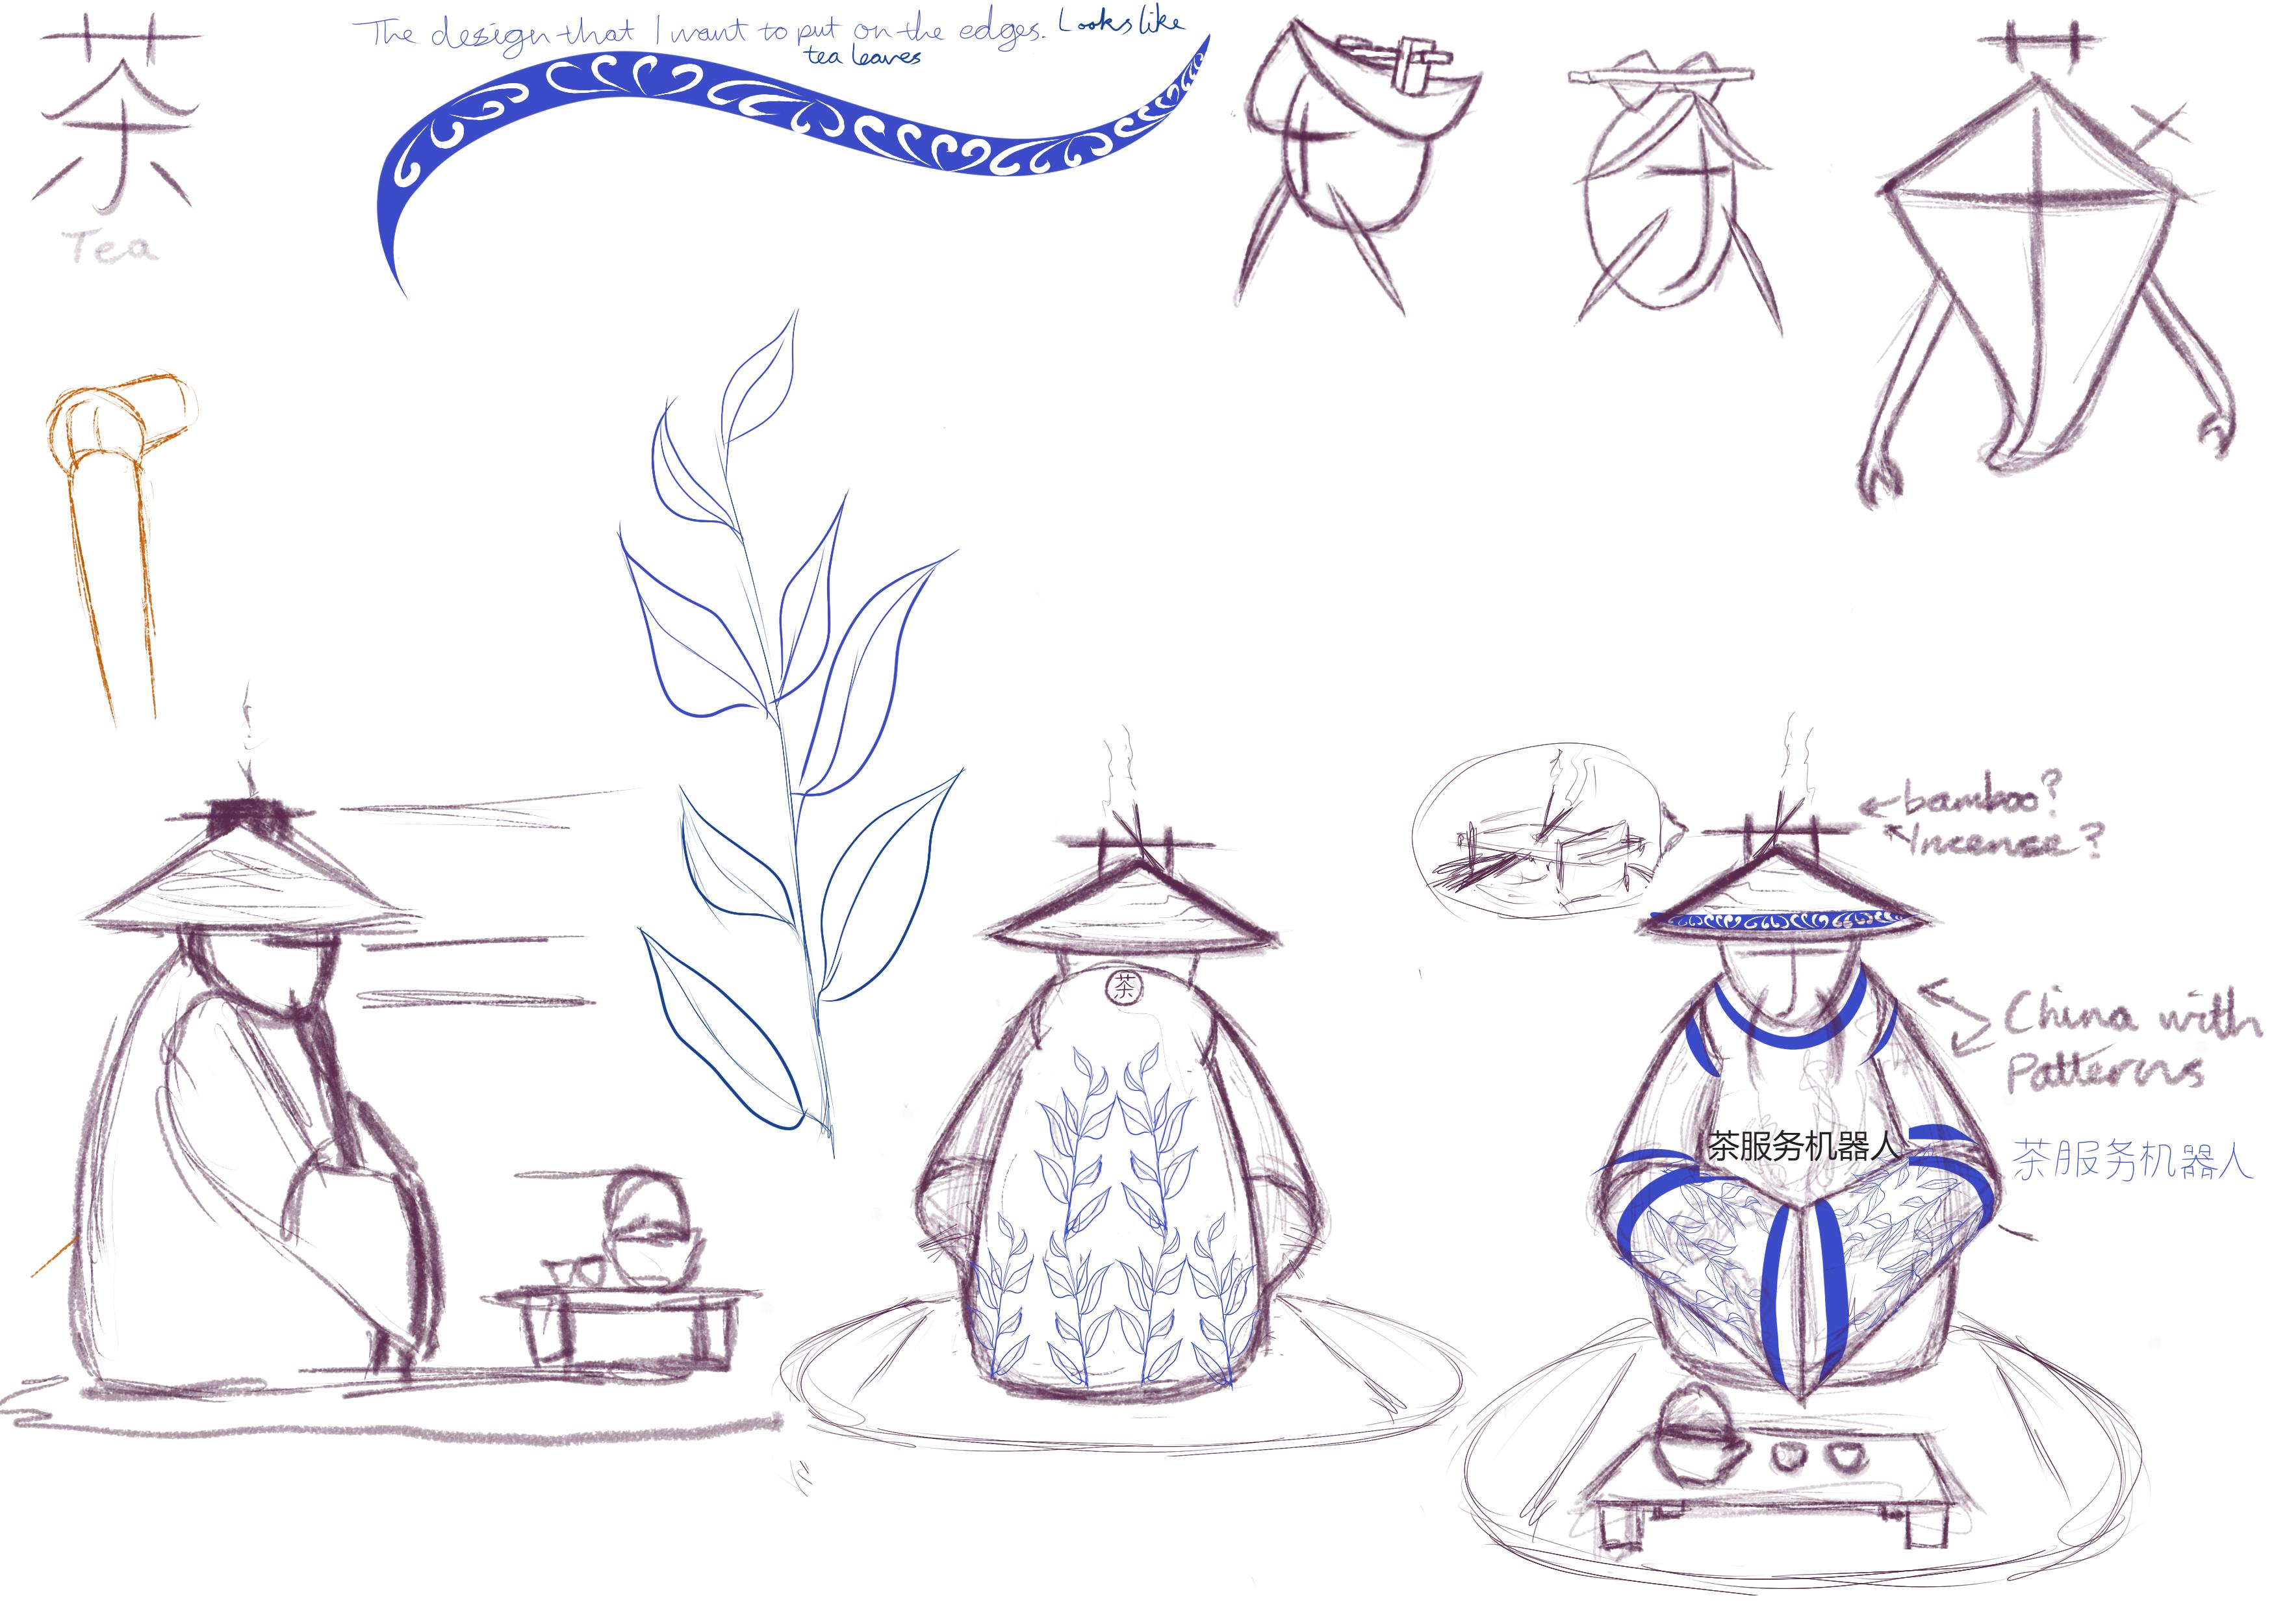 tea robot designs